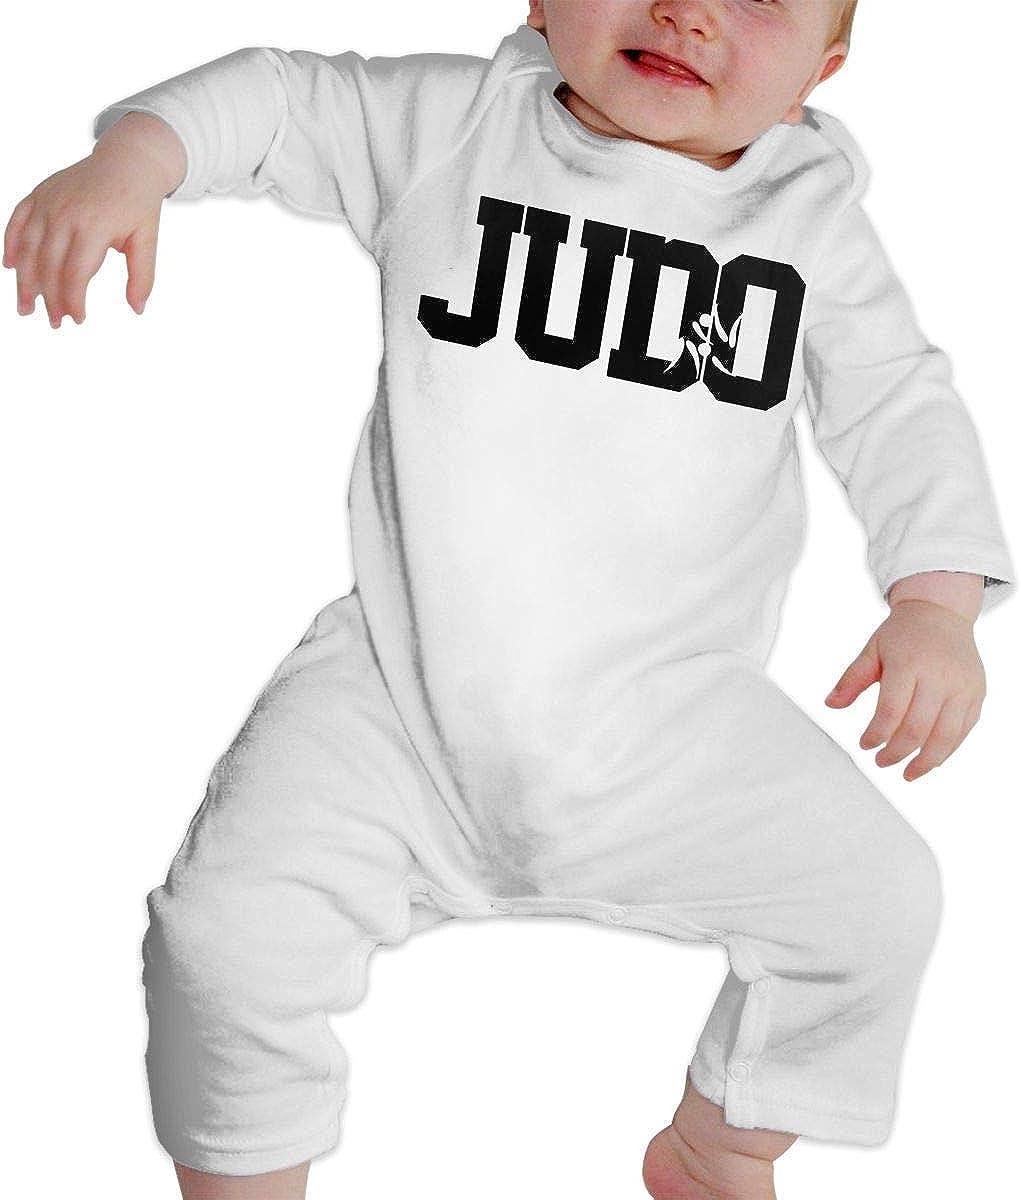 WlQshop Tute da Bambino,Body Bimbo Bimba Judo Letter Newborn Kids Long Sleeve Gentleman Bodysuit